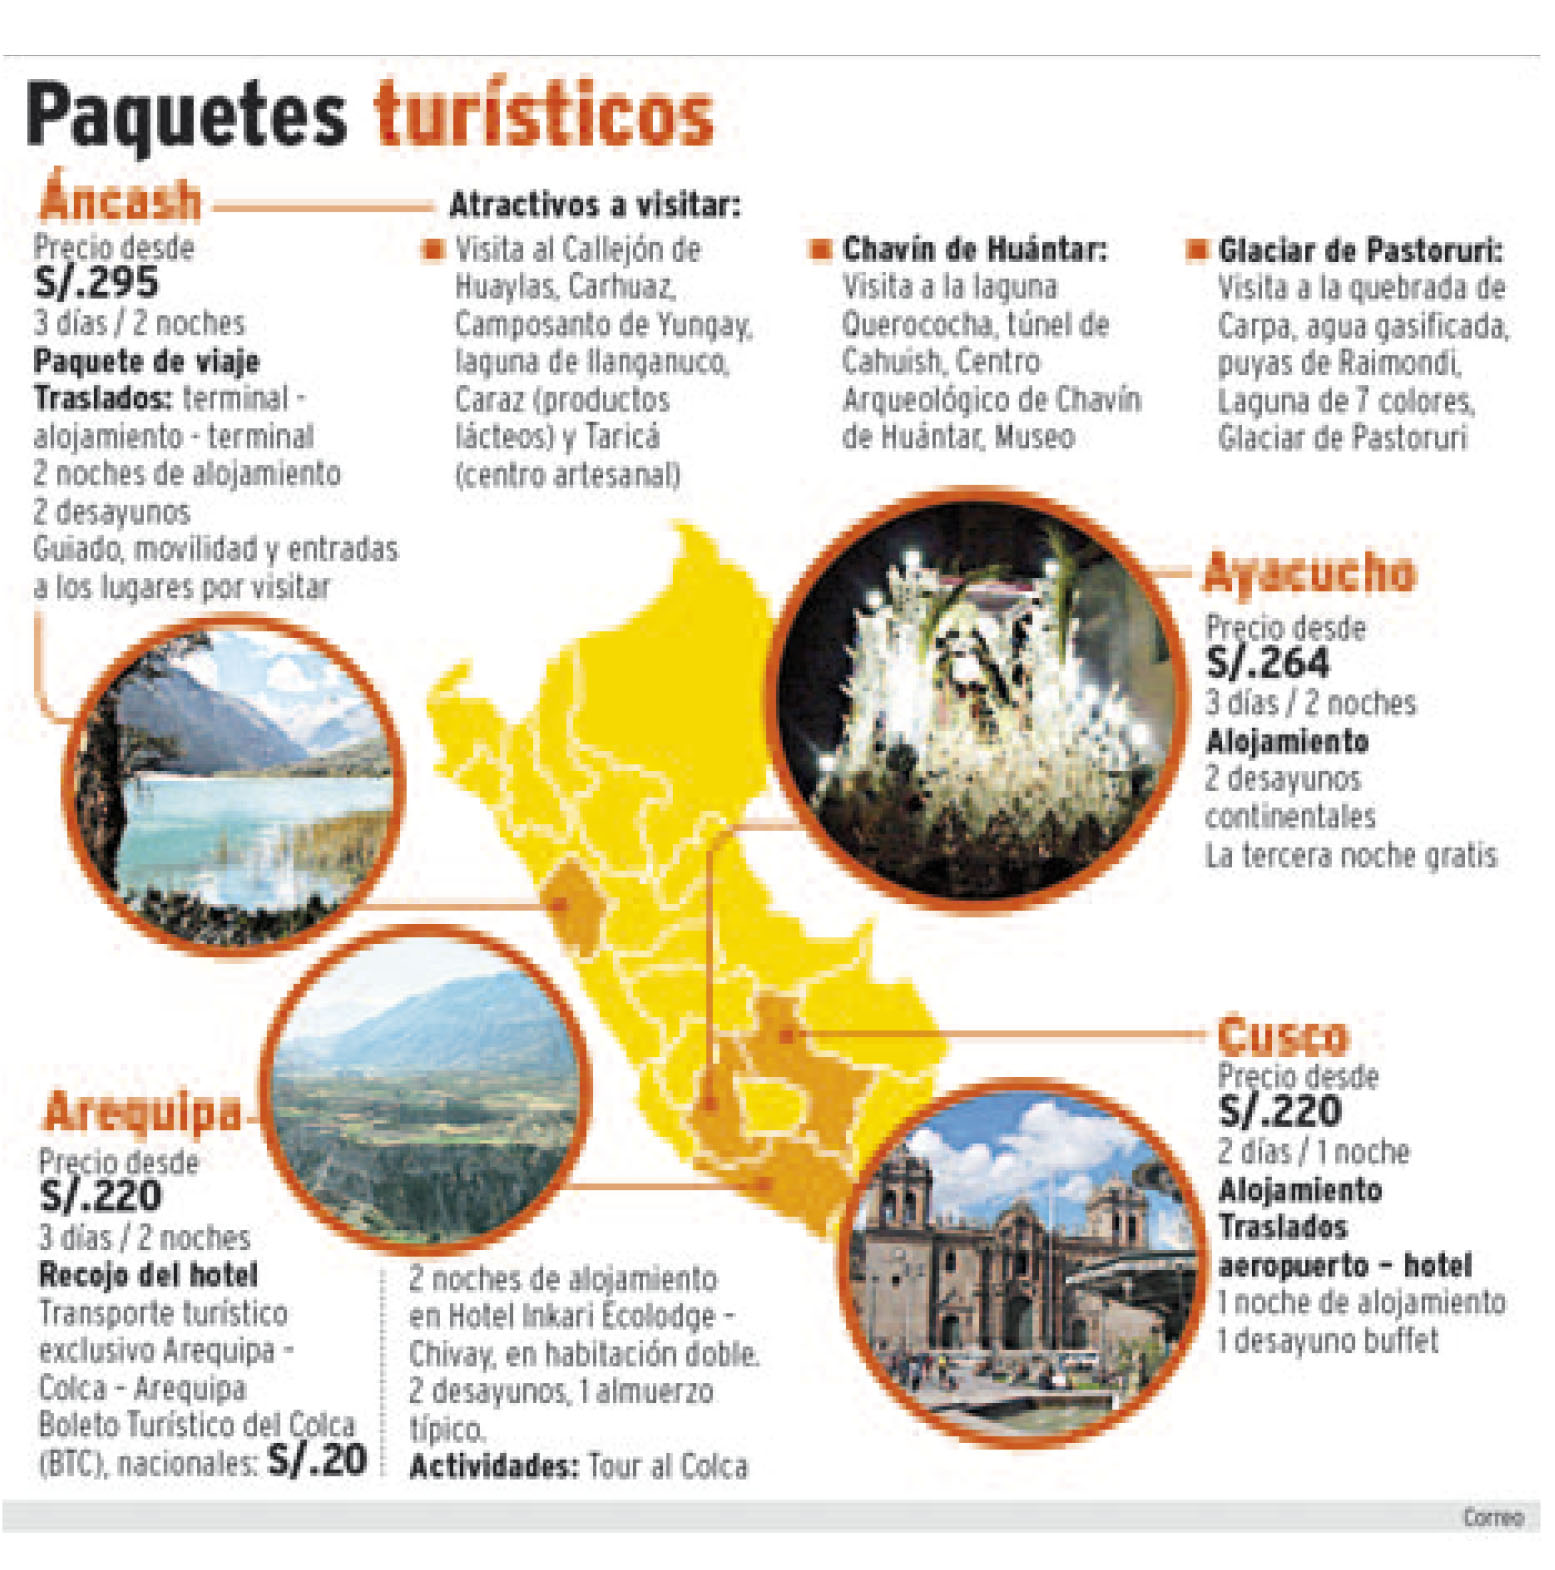 Fuente: Diario Correo - Elaborada porDiario Correo